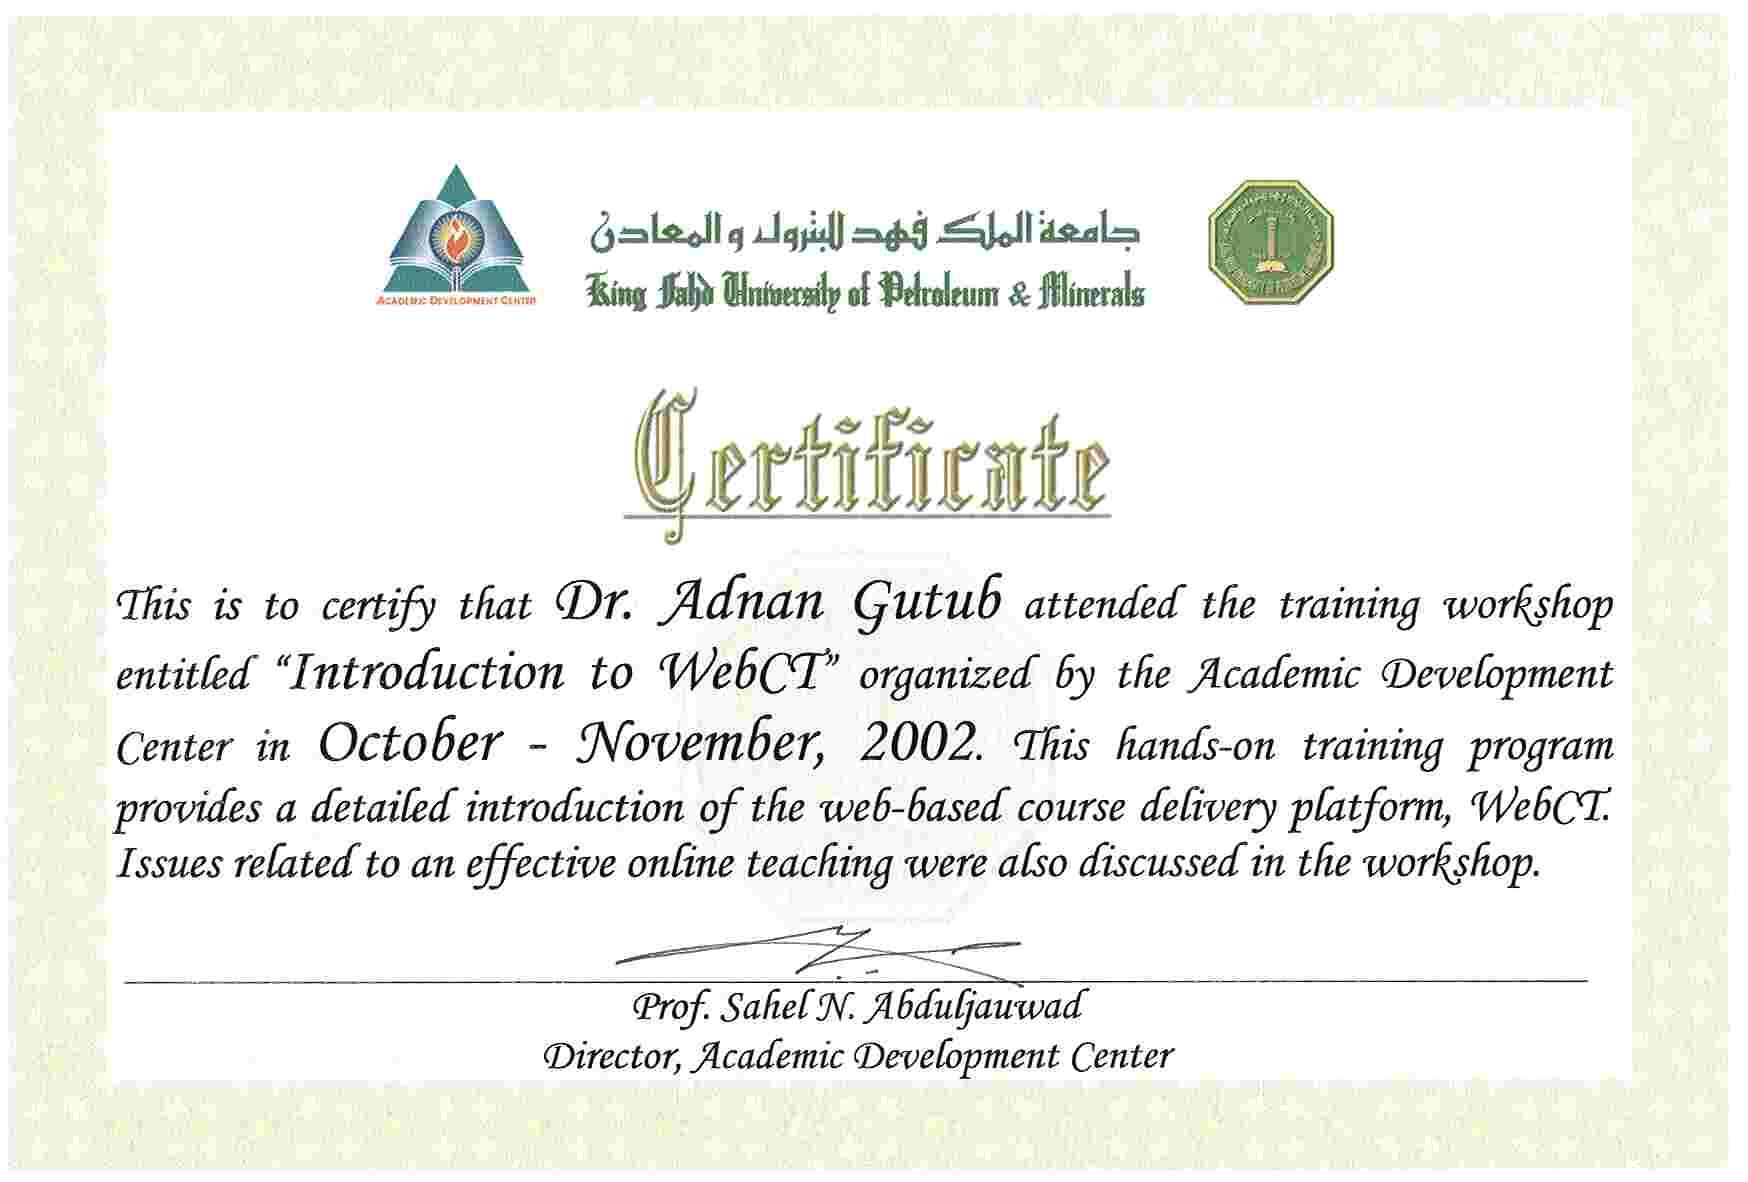 Professional Development Adnan Abdulaziz Muhammad Gutub